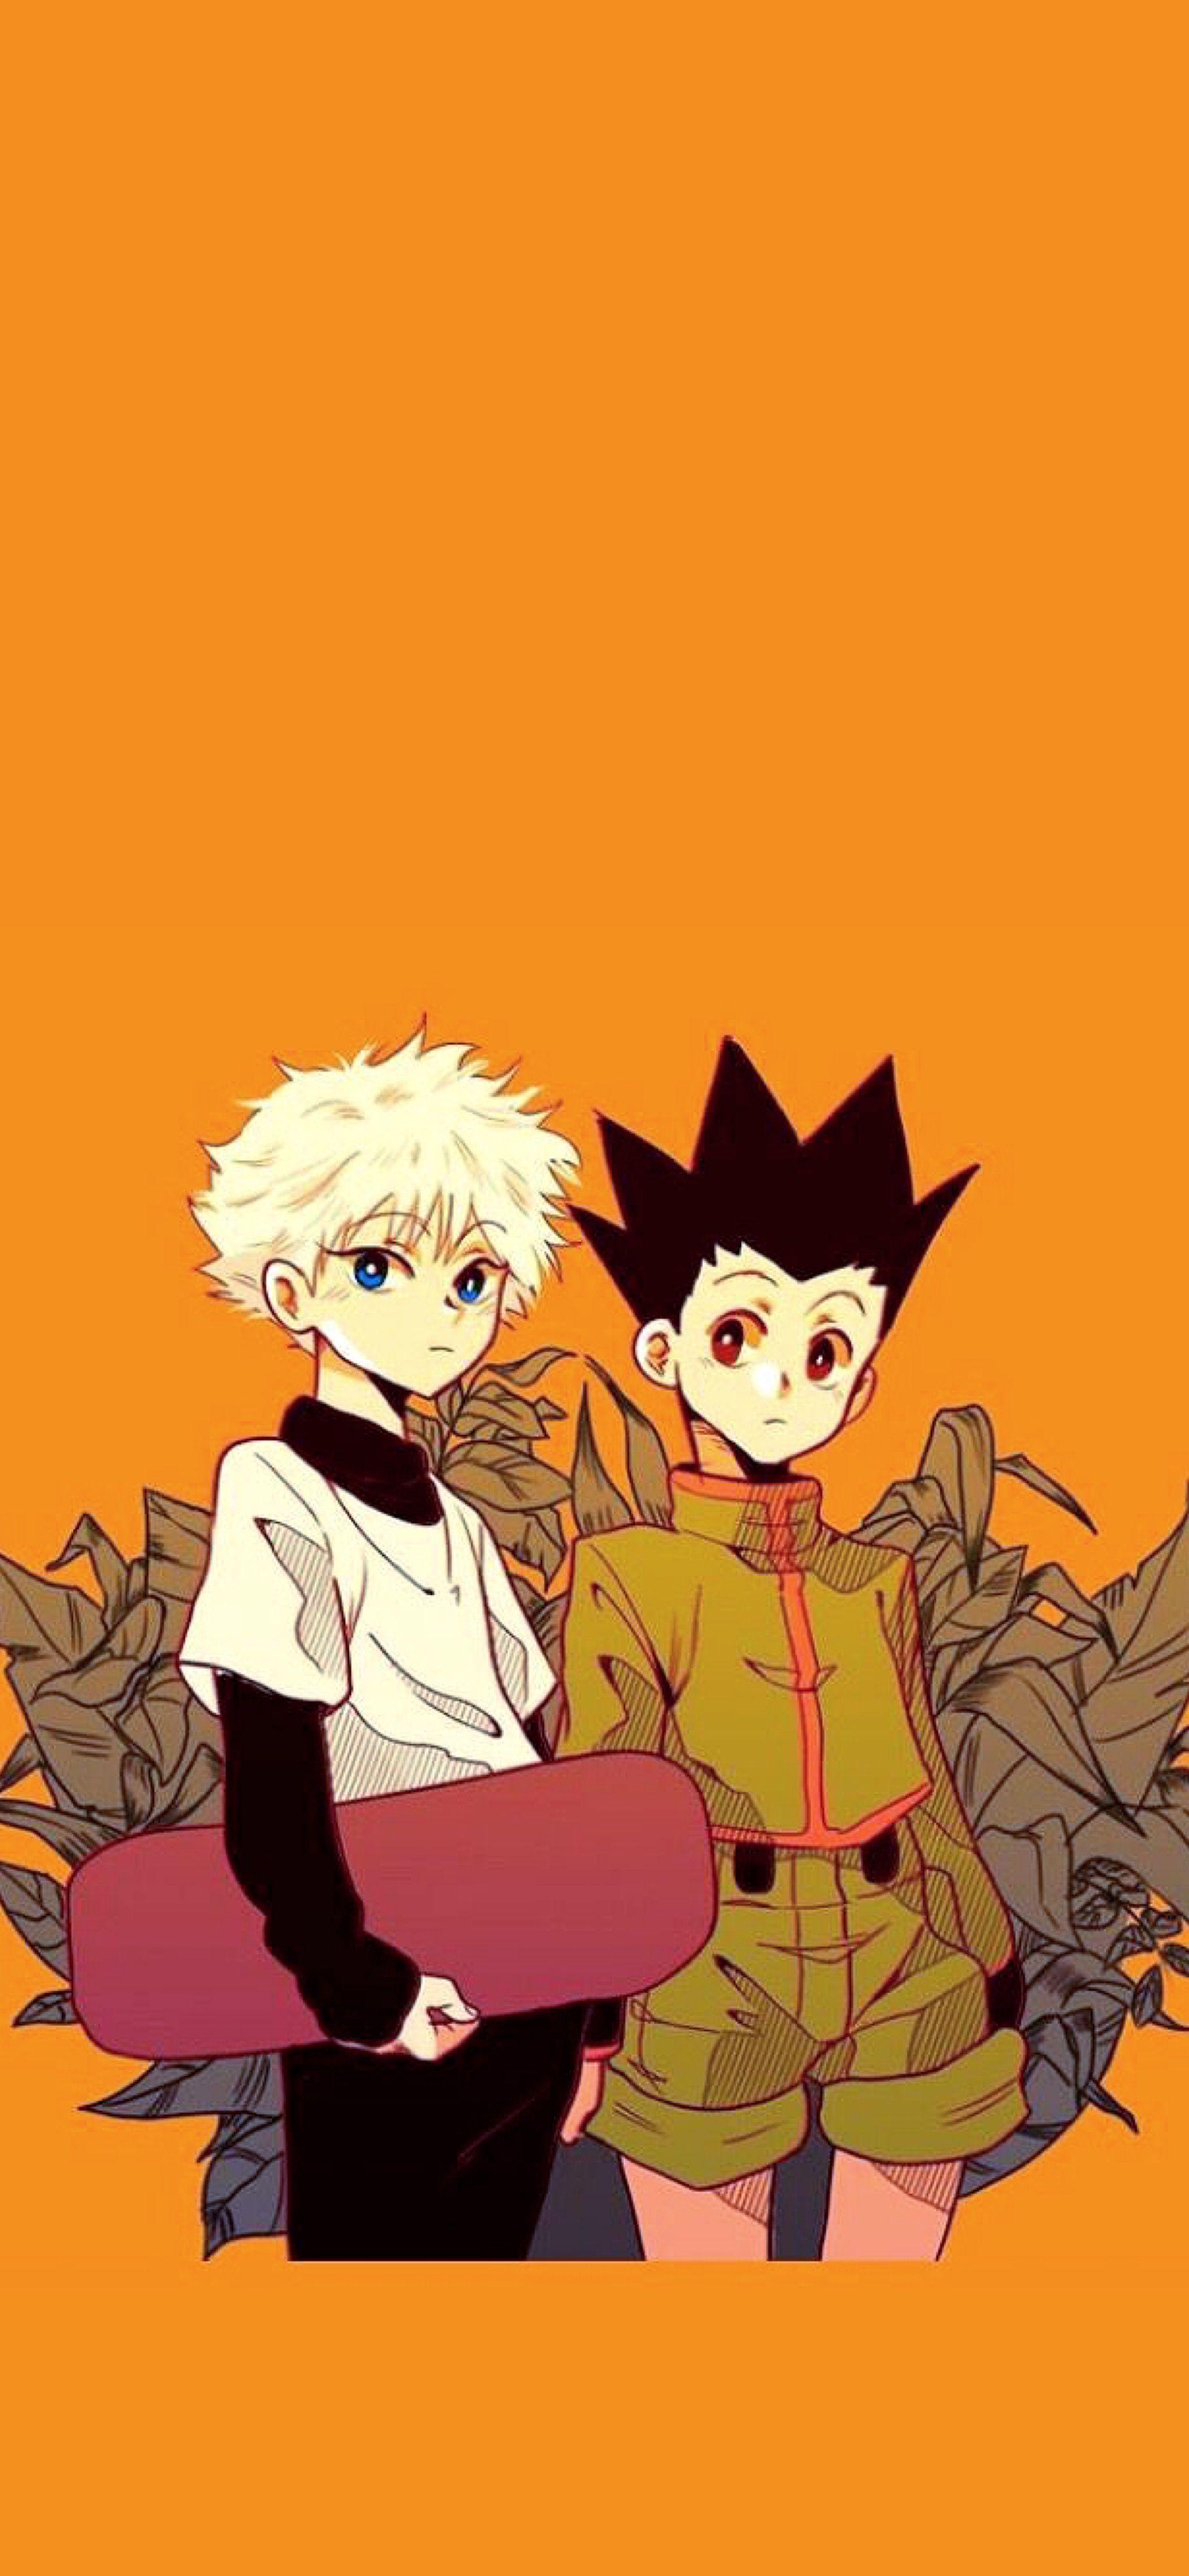 Gon And Killua Wallpaper Hunter Anime Anime Lock Screen Anime Wallpaper Iphone